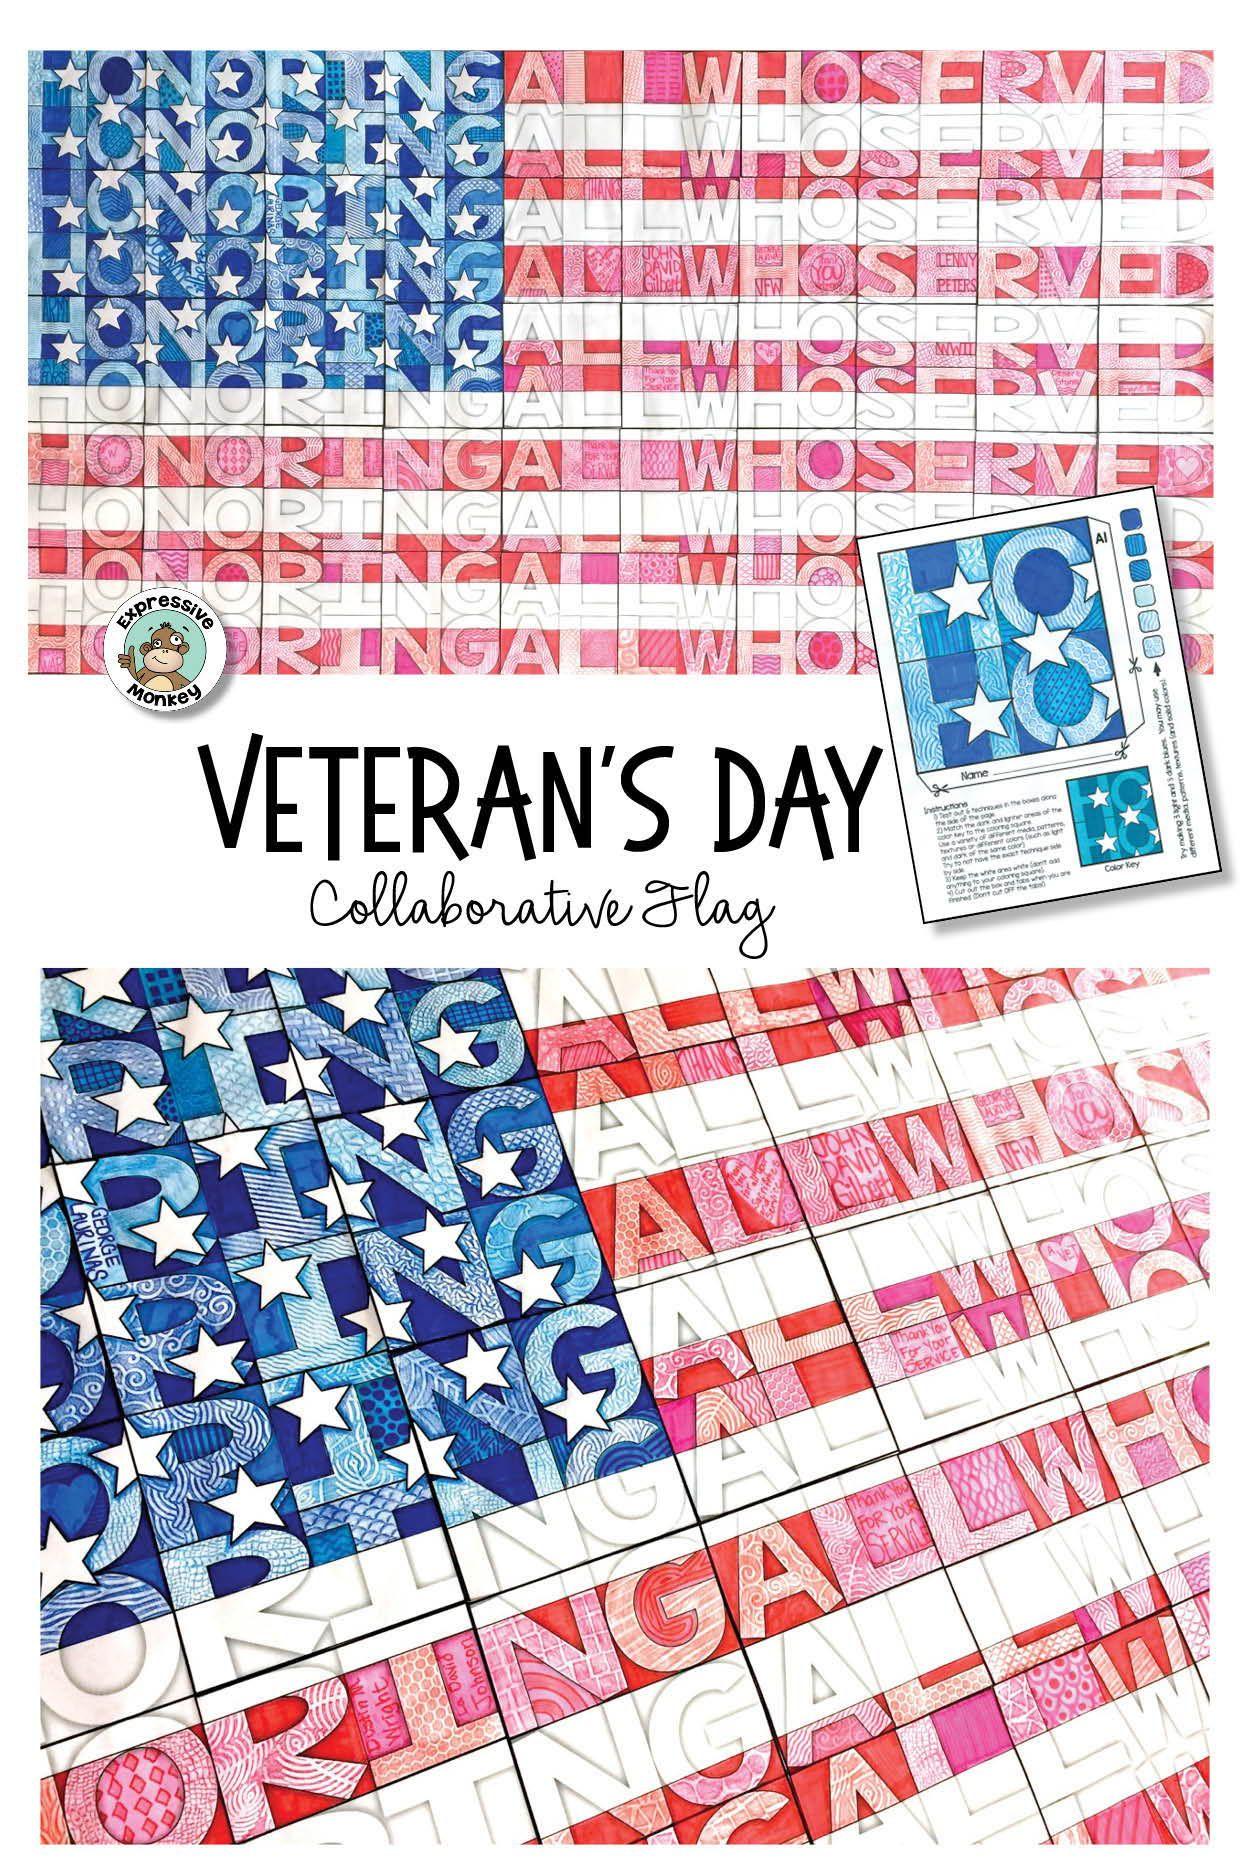 Veteran S Day Art Activity Collaborative Flag Poster Art Activities Art Activities For Kids Veterans Day